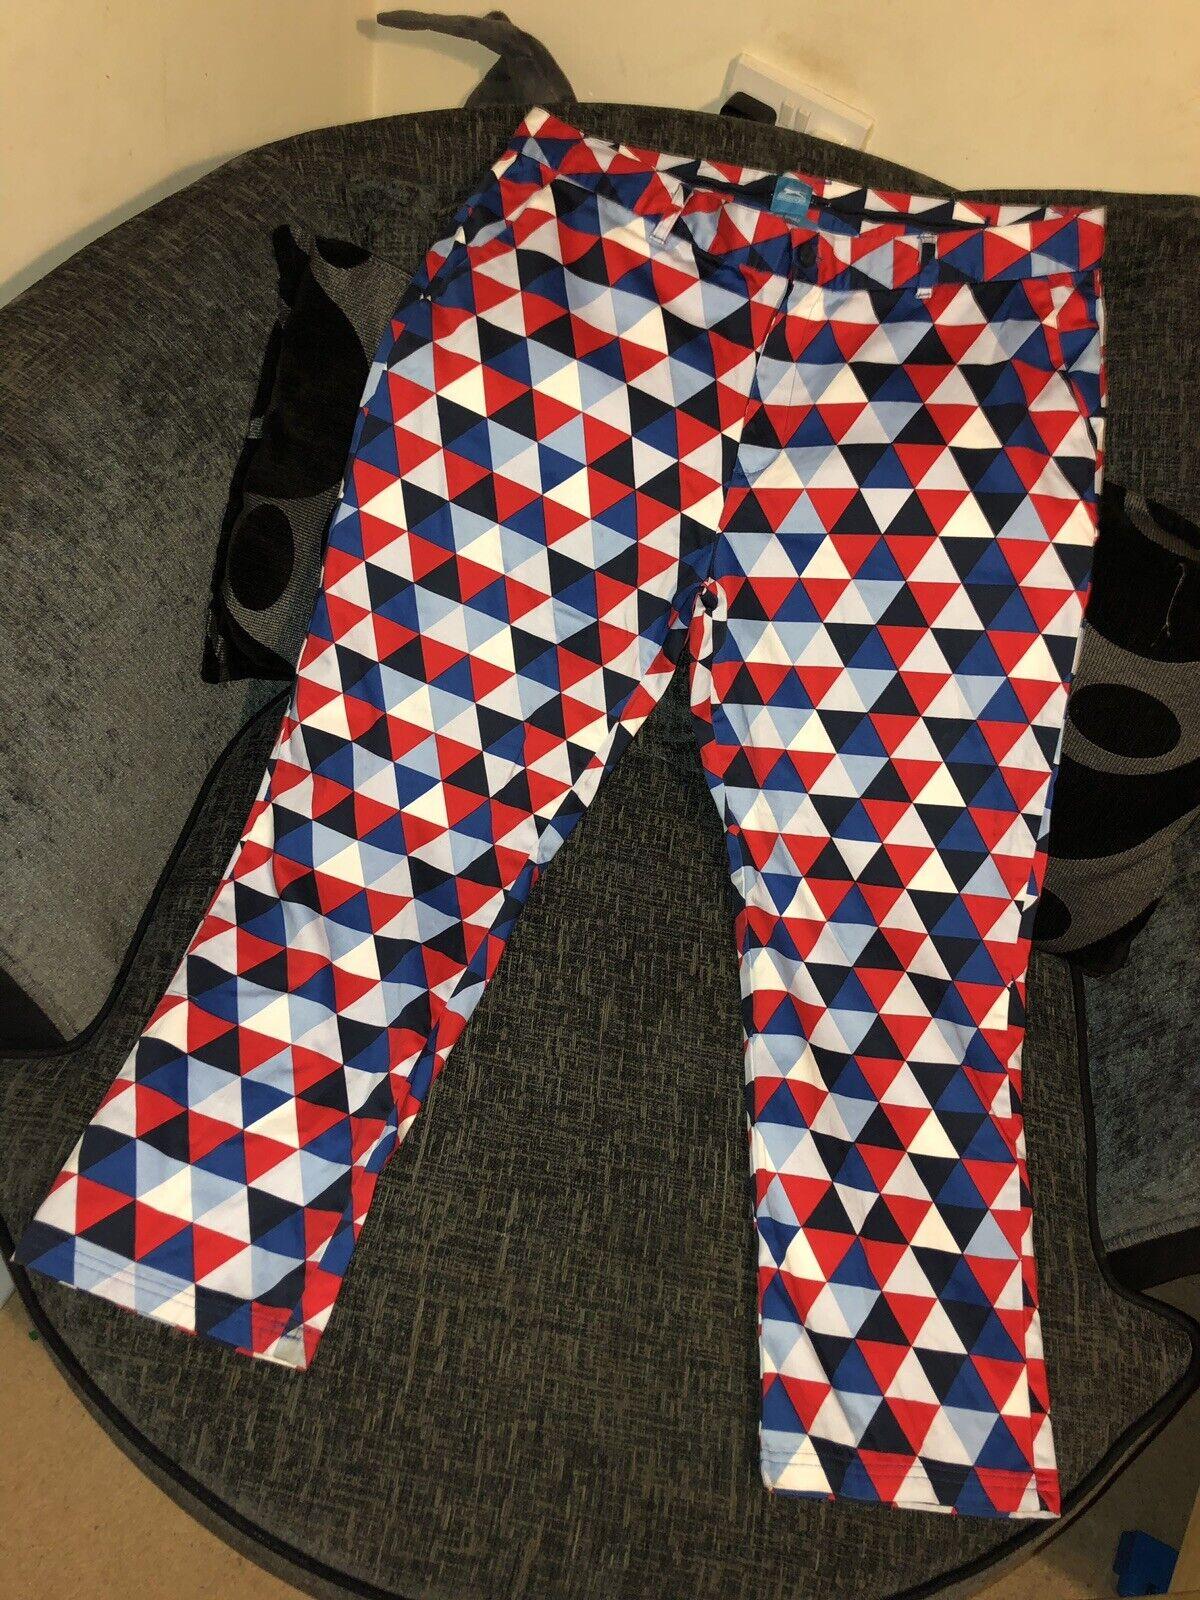 38w Slazenger Trousers Rare Pattern Funky Artist Chef Type Eccentric